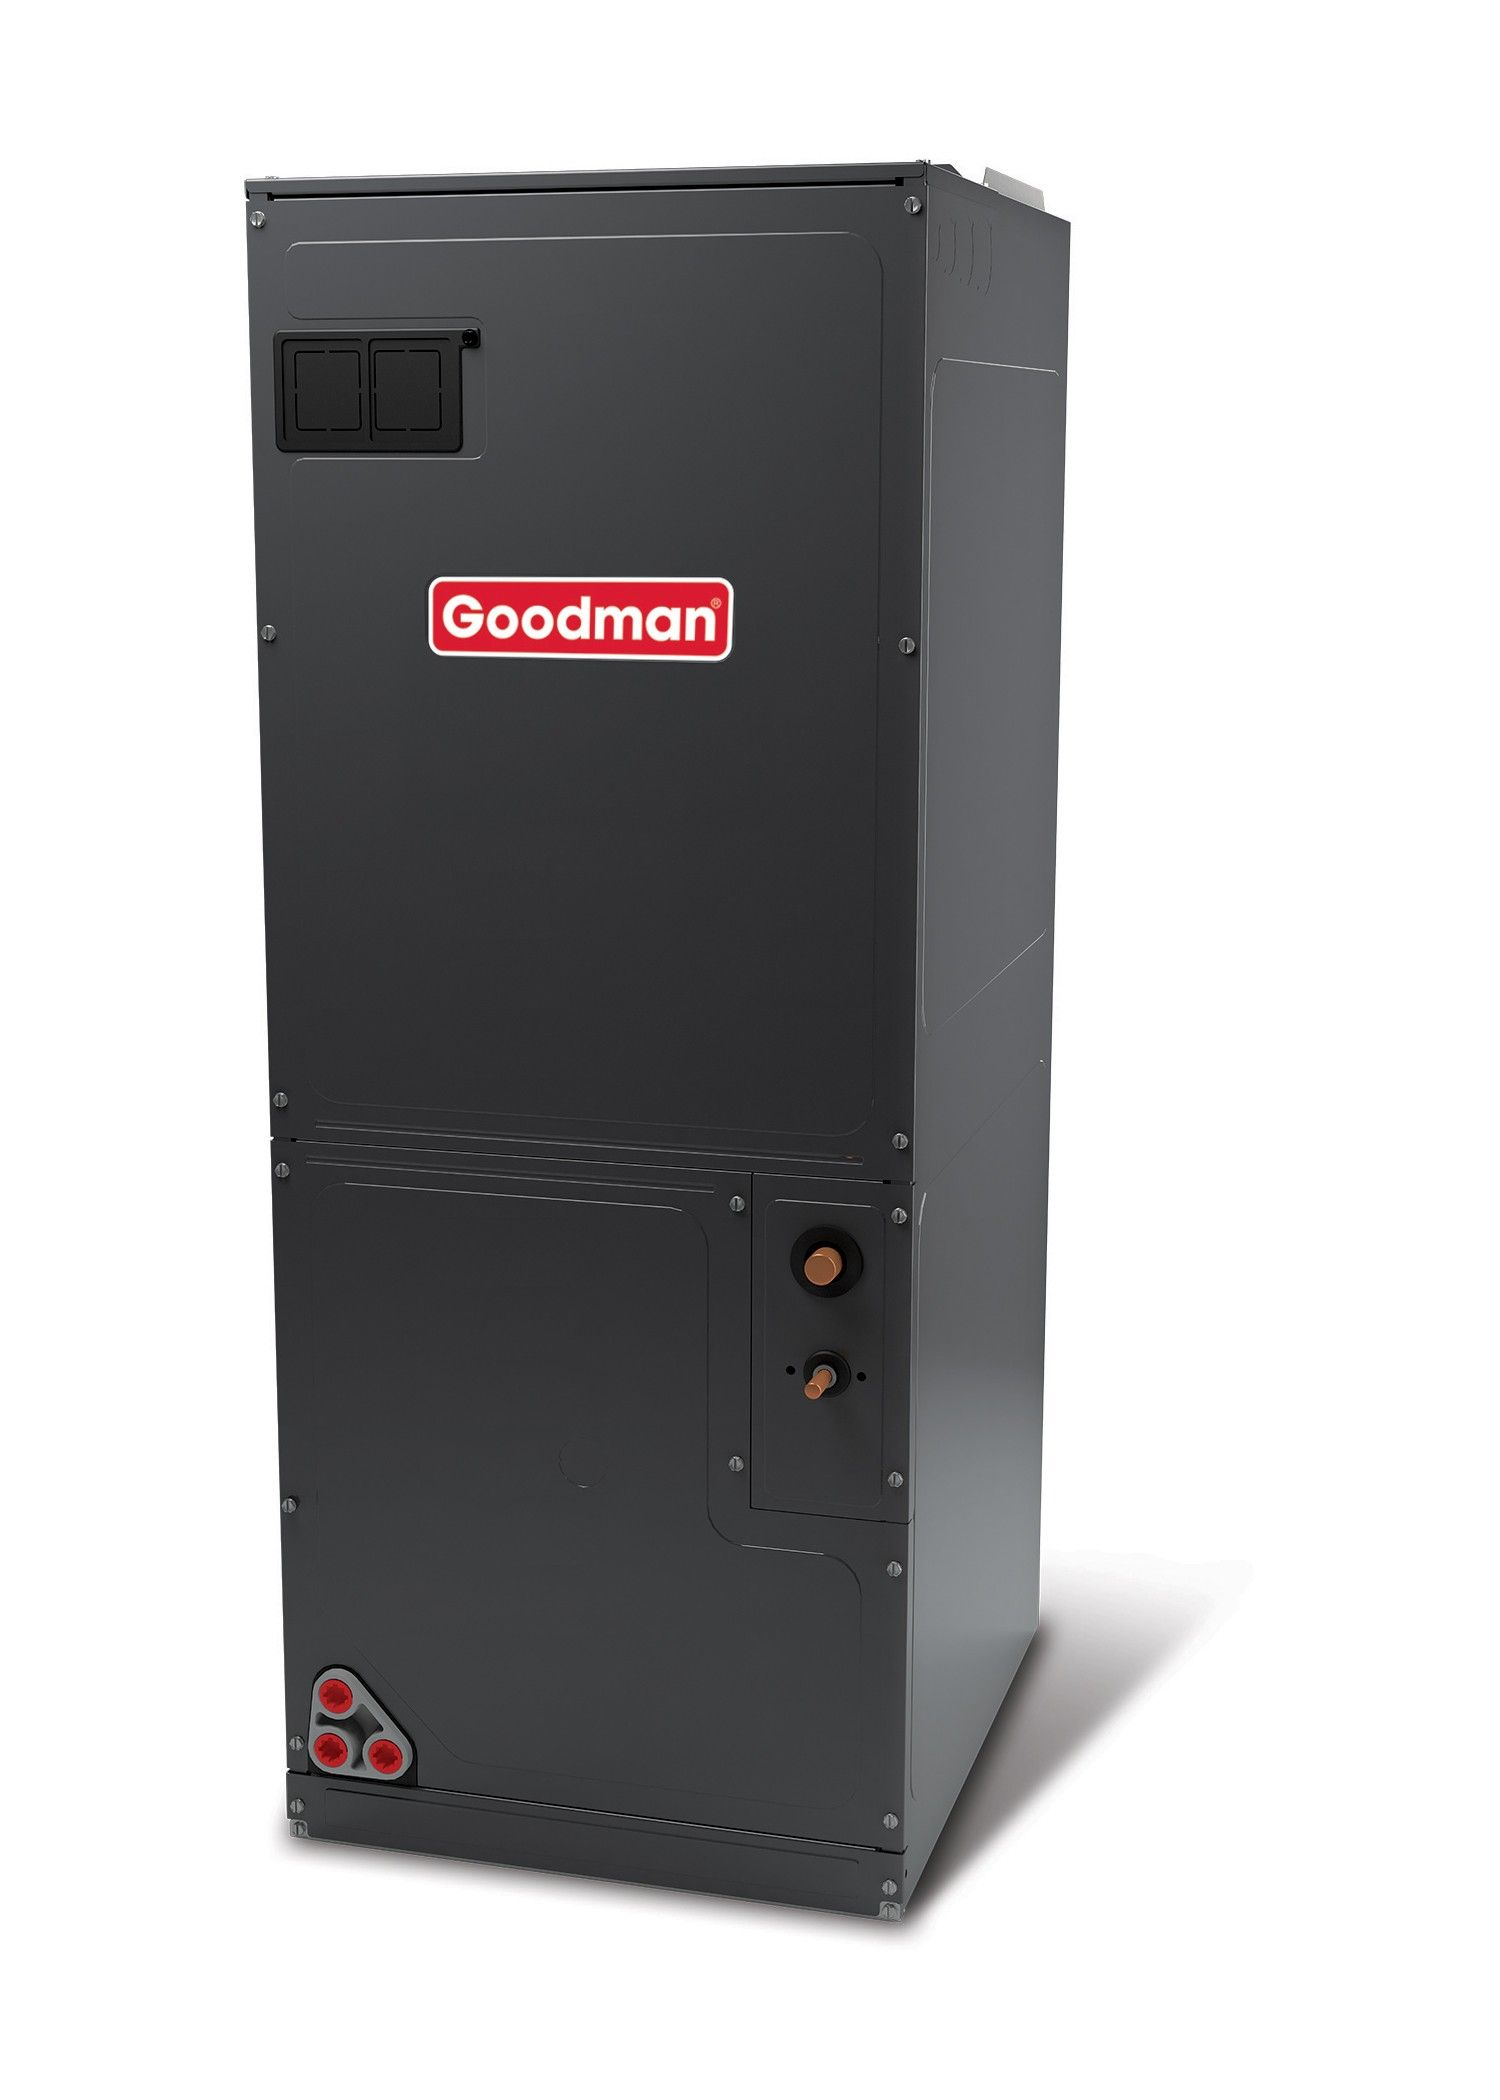 Goodman 3.5 Ton ASPT High-Efficiency Multiposition Air Handler